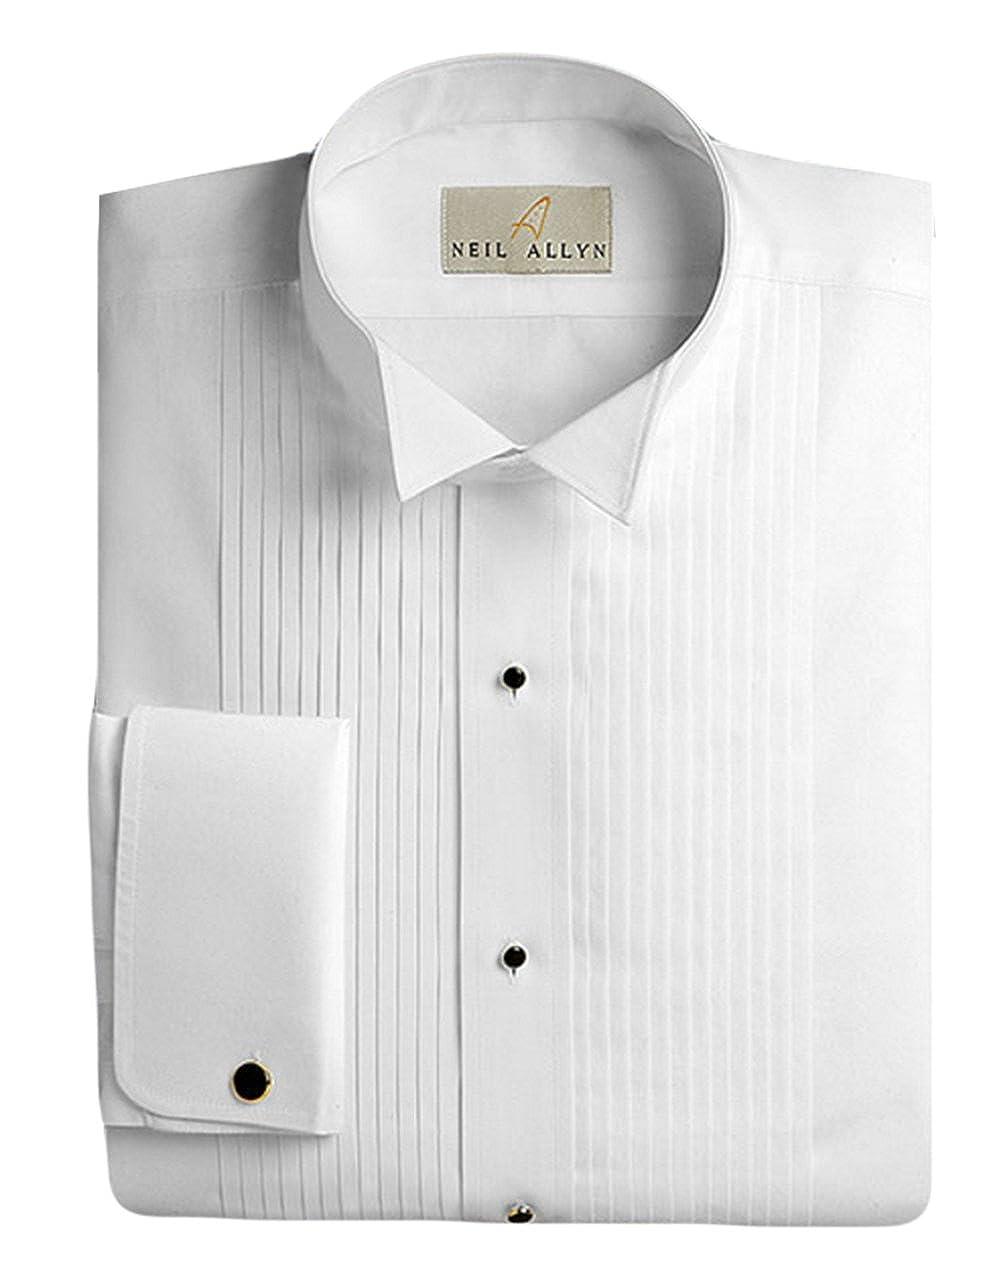 Neil Allyn Men's Tuxedo Shirt 100% Cotton 1/4 Pleat Wing Collar